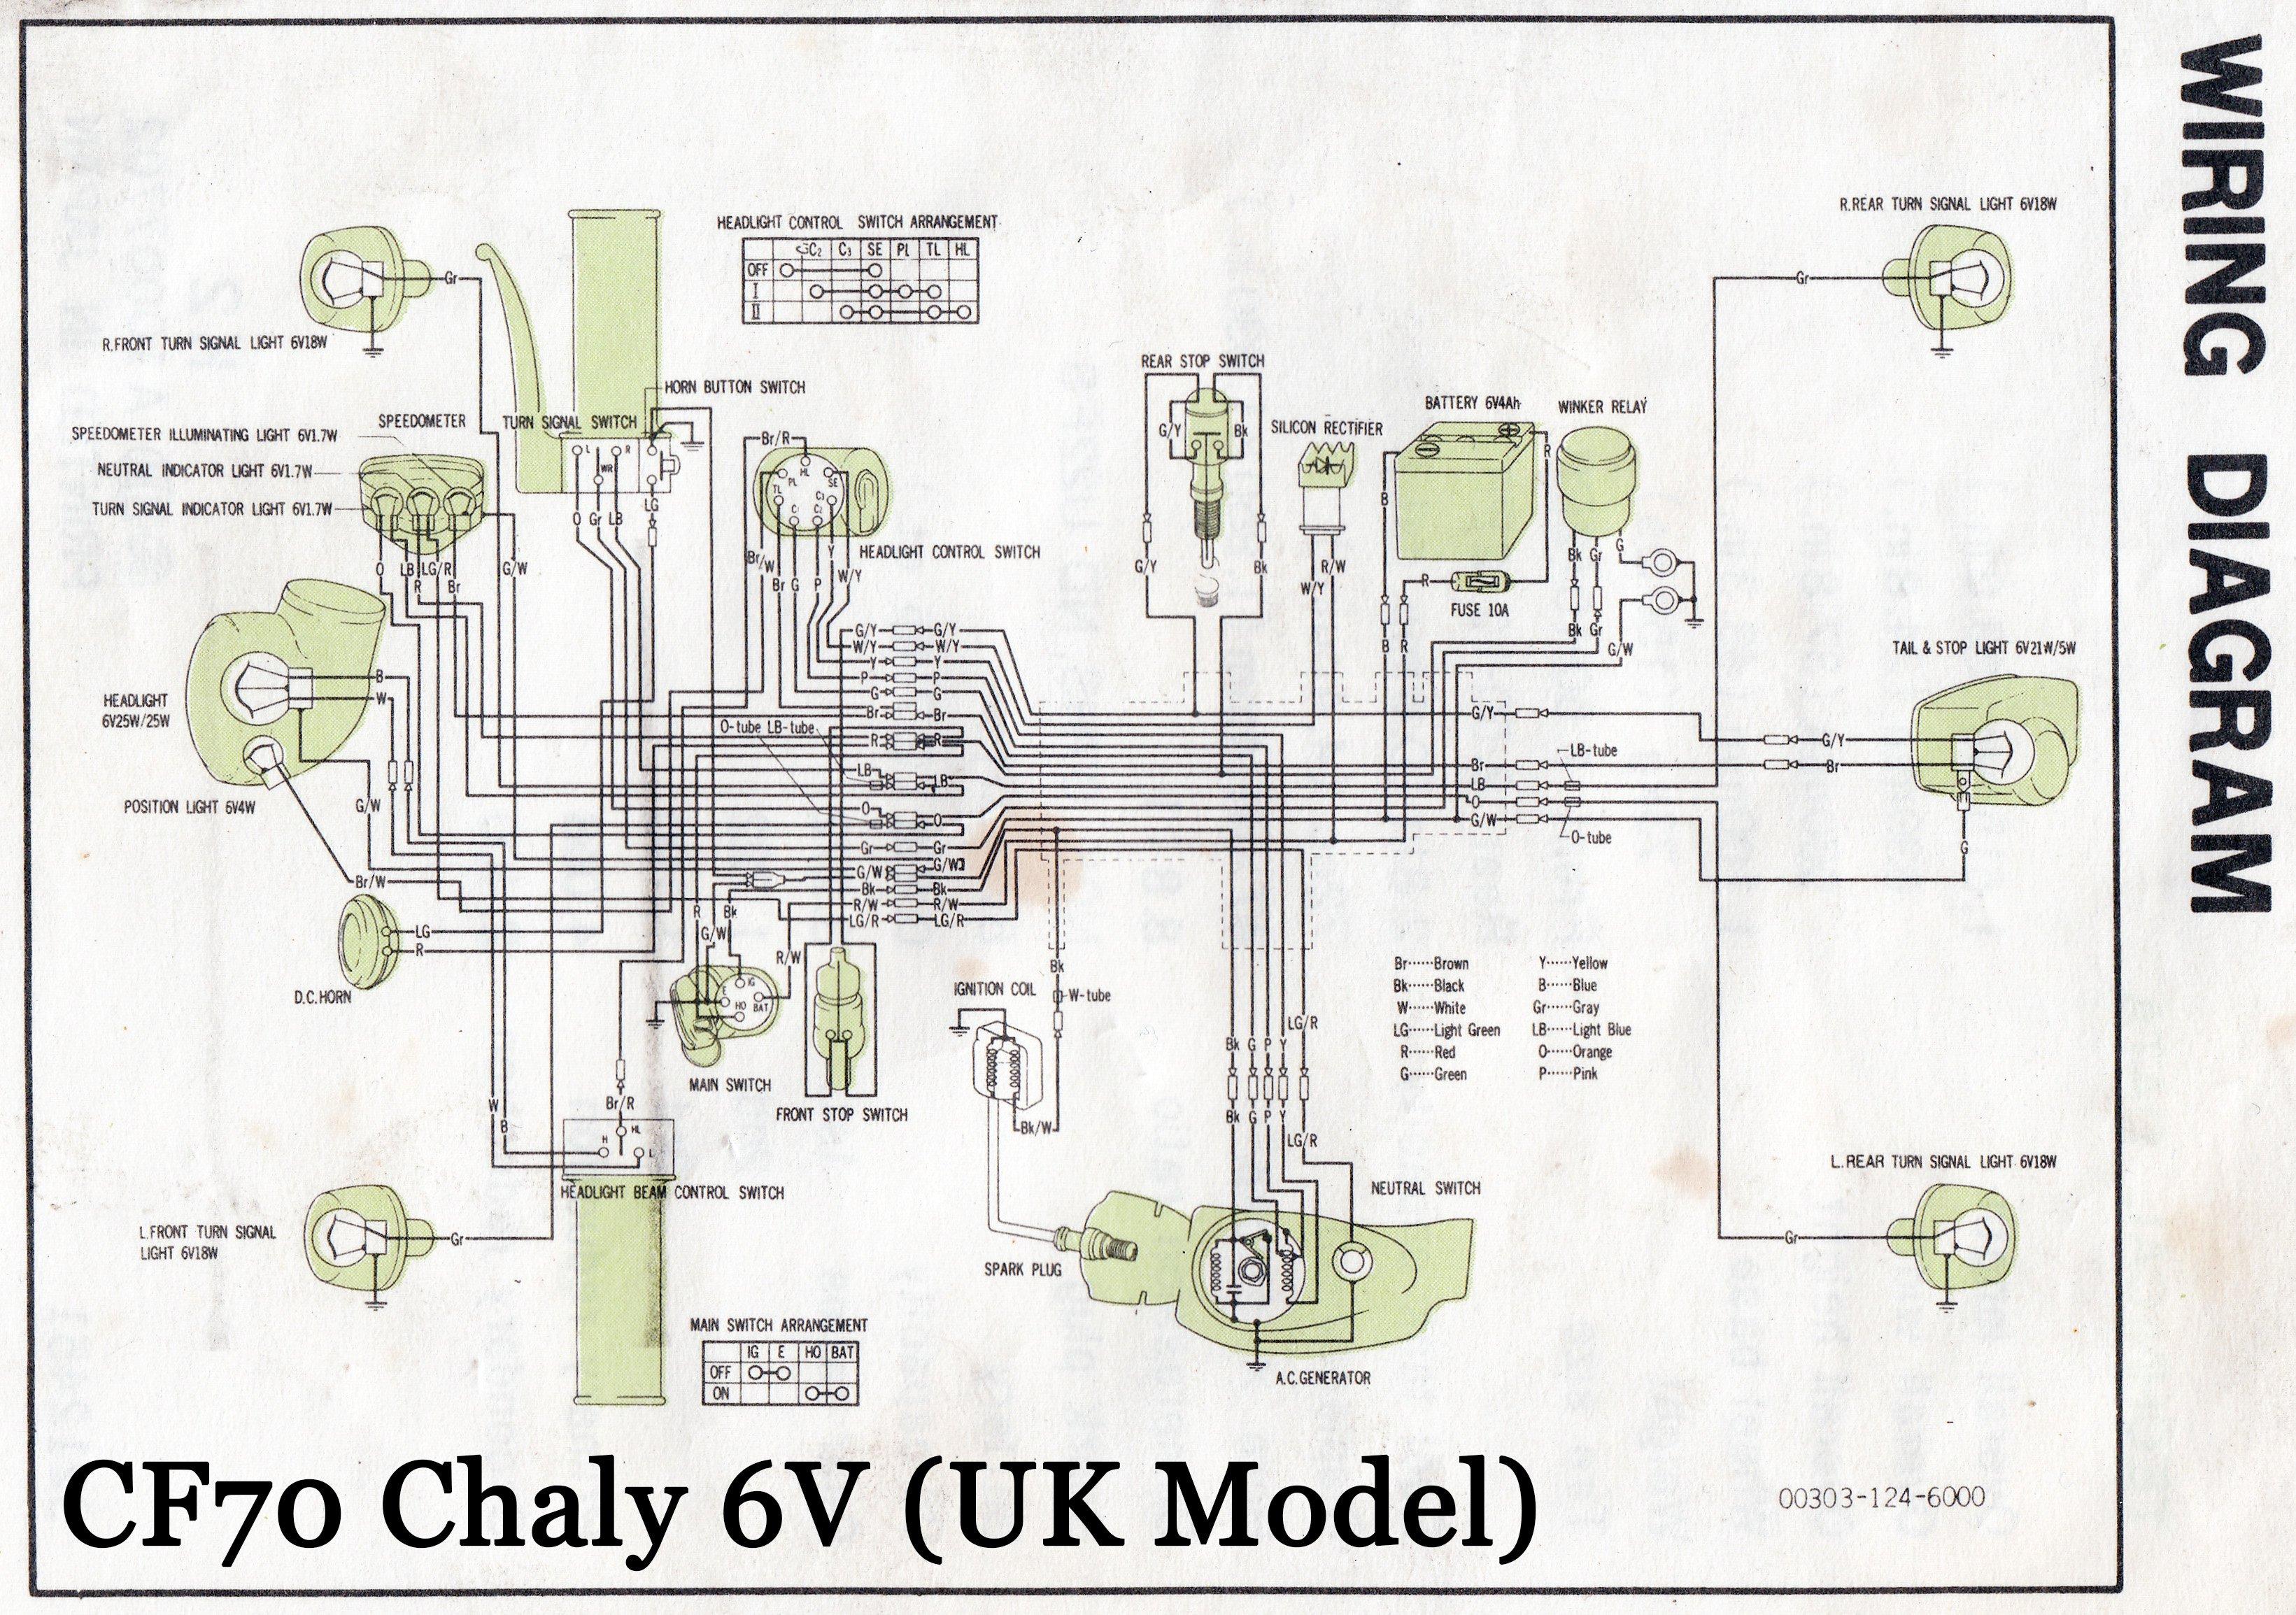 [SCHEMATICS_48IU]  DB_9579] Honda St70 Electrical Wiring Diagram Wiring Diagram | Honda St70 Wiring Diagram |  | Crove Bletu Benol Mohammedshrine Librar Wiring 101